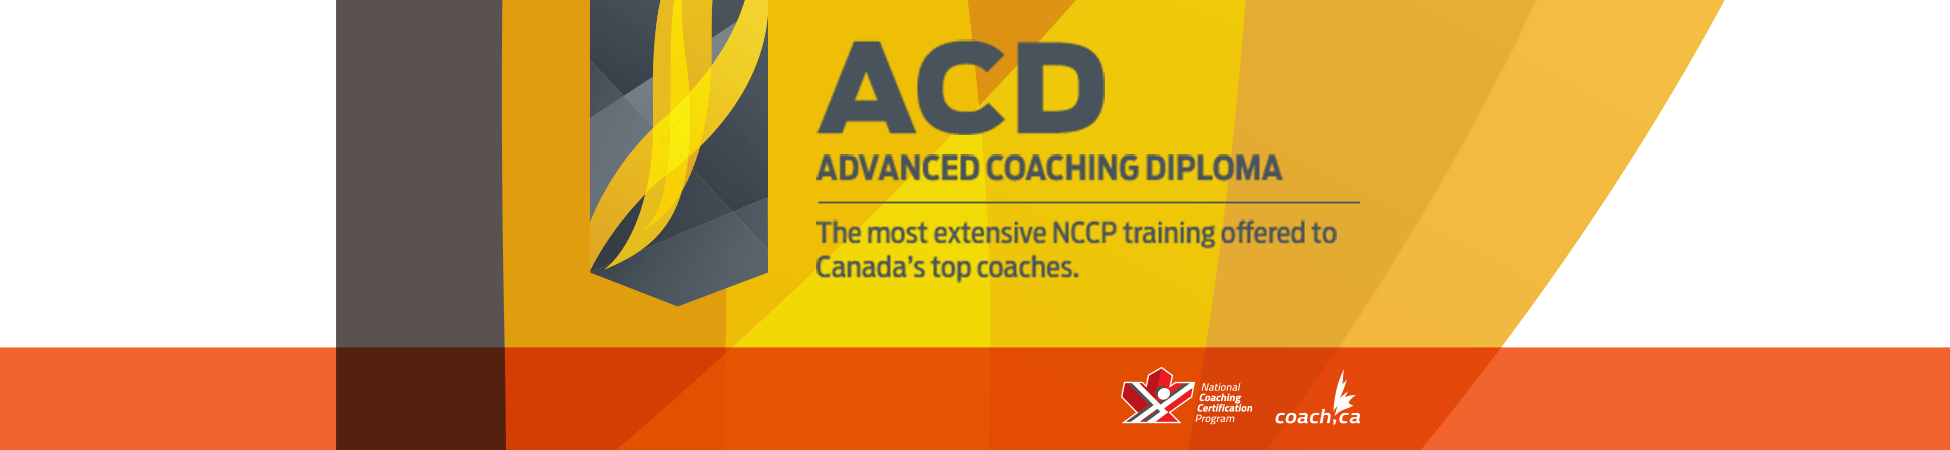 Advanced Coaching Diploma